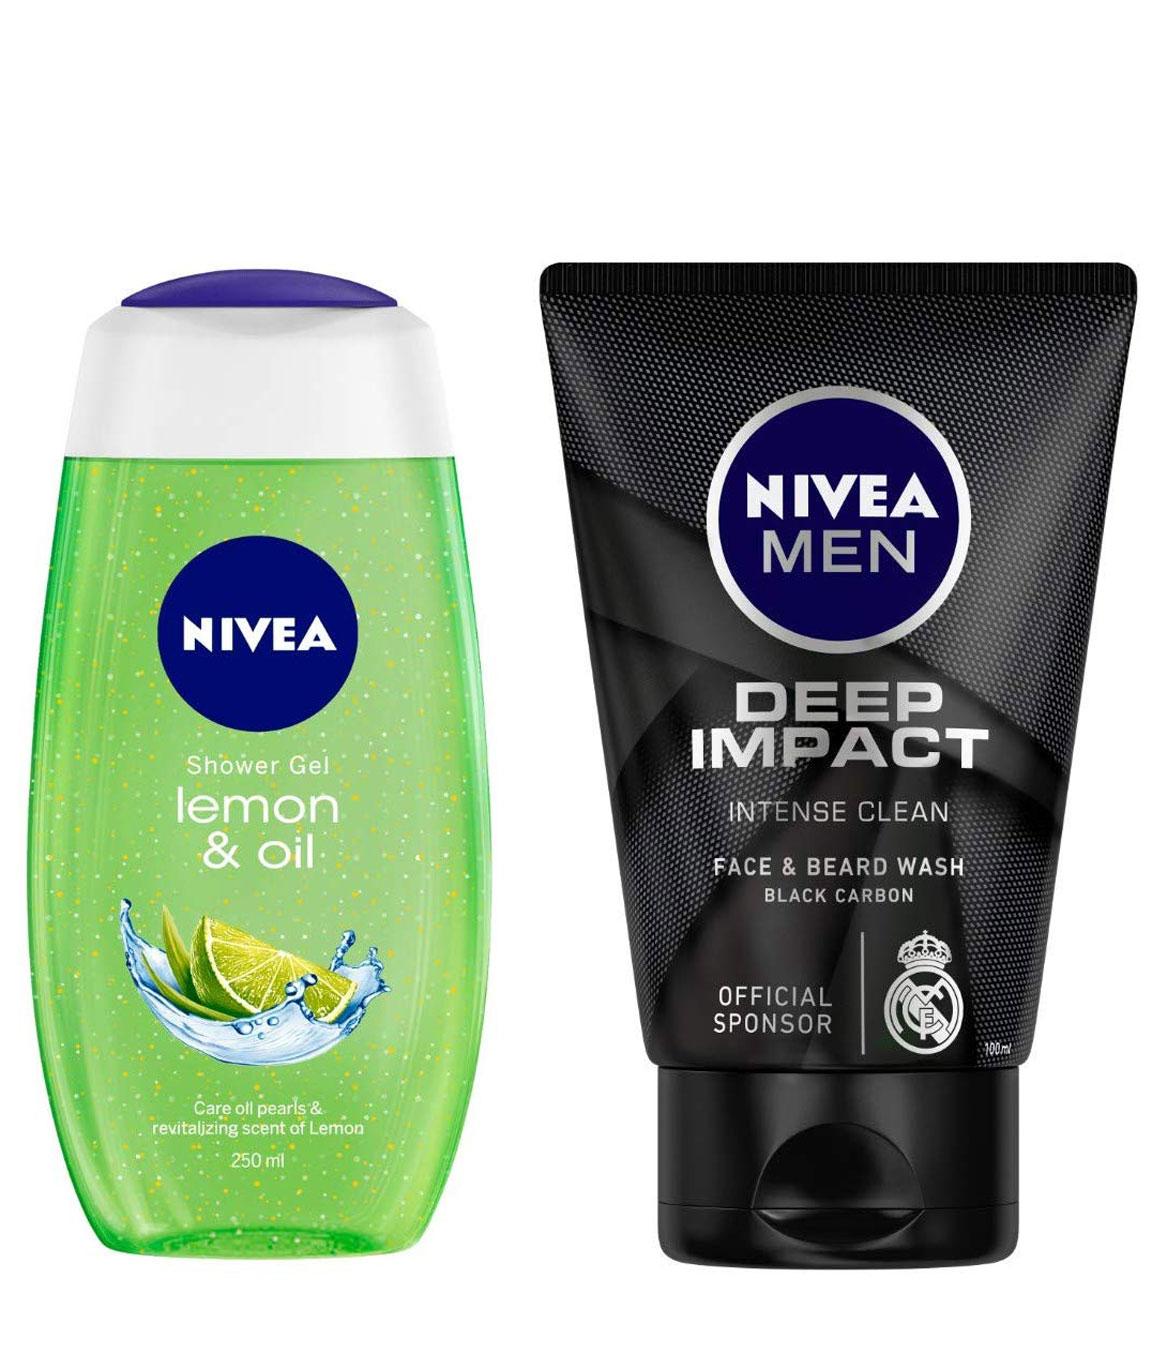 NIVEA Shower Gel, Lemon & Oil, 250ml & MEN Face & Beard Wash, Deep Impact Intense Clean, 100ml Combo